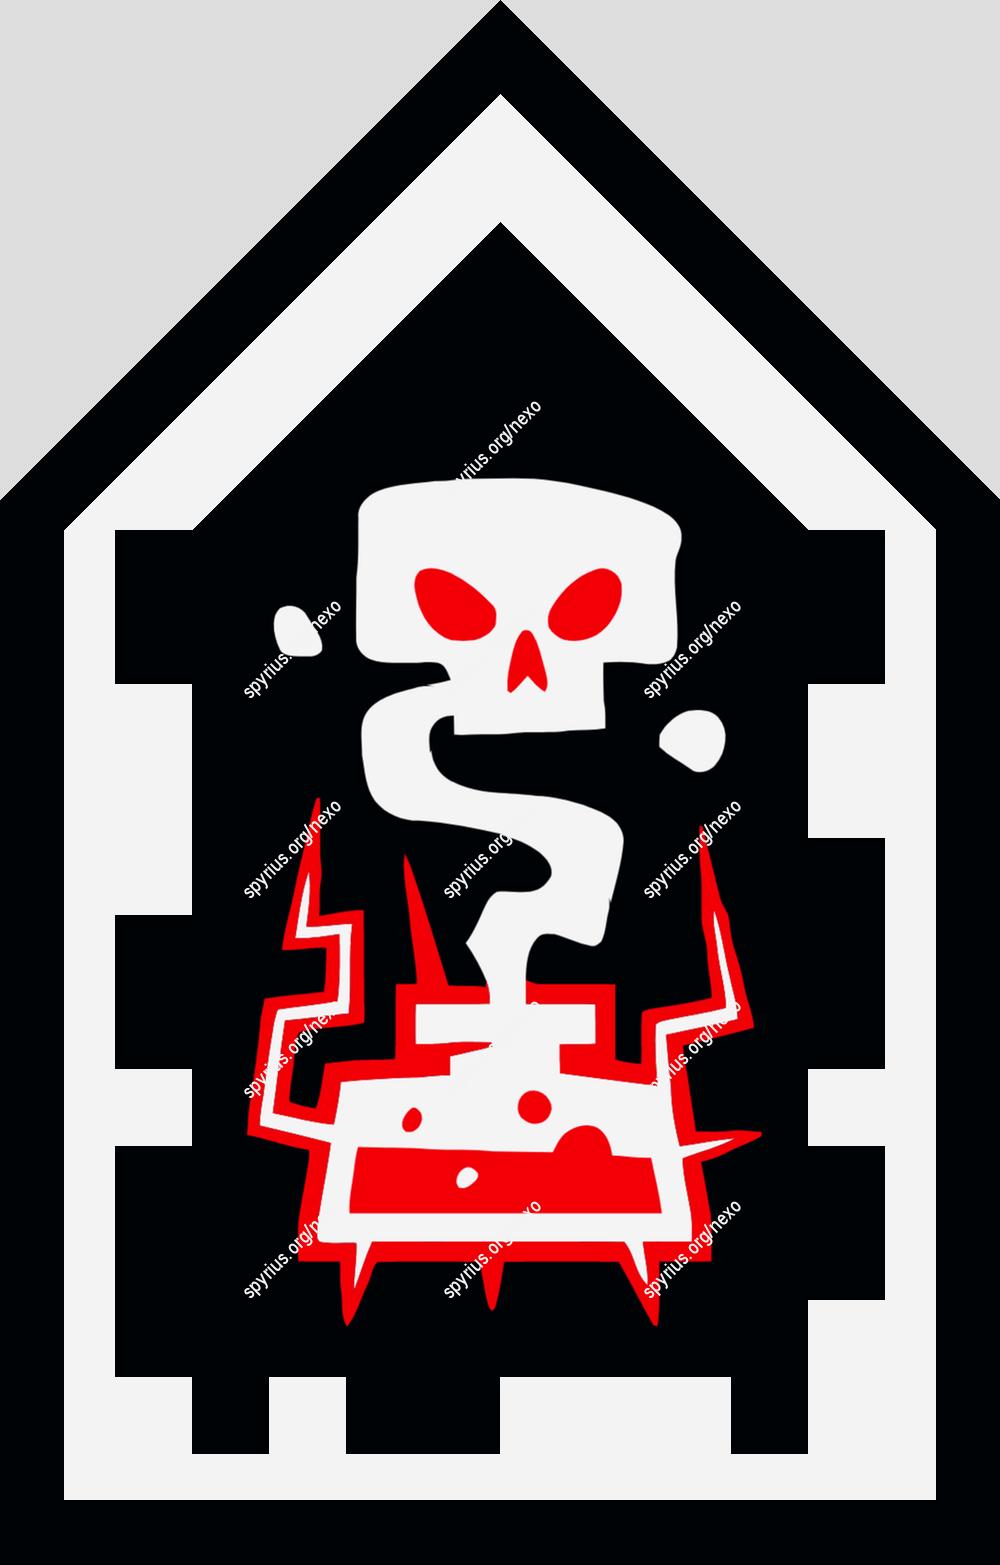 Lego Nexo Knights Power Macy Evil Evaporate Spyrius Org